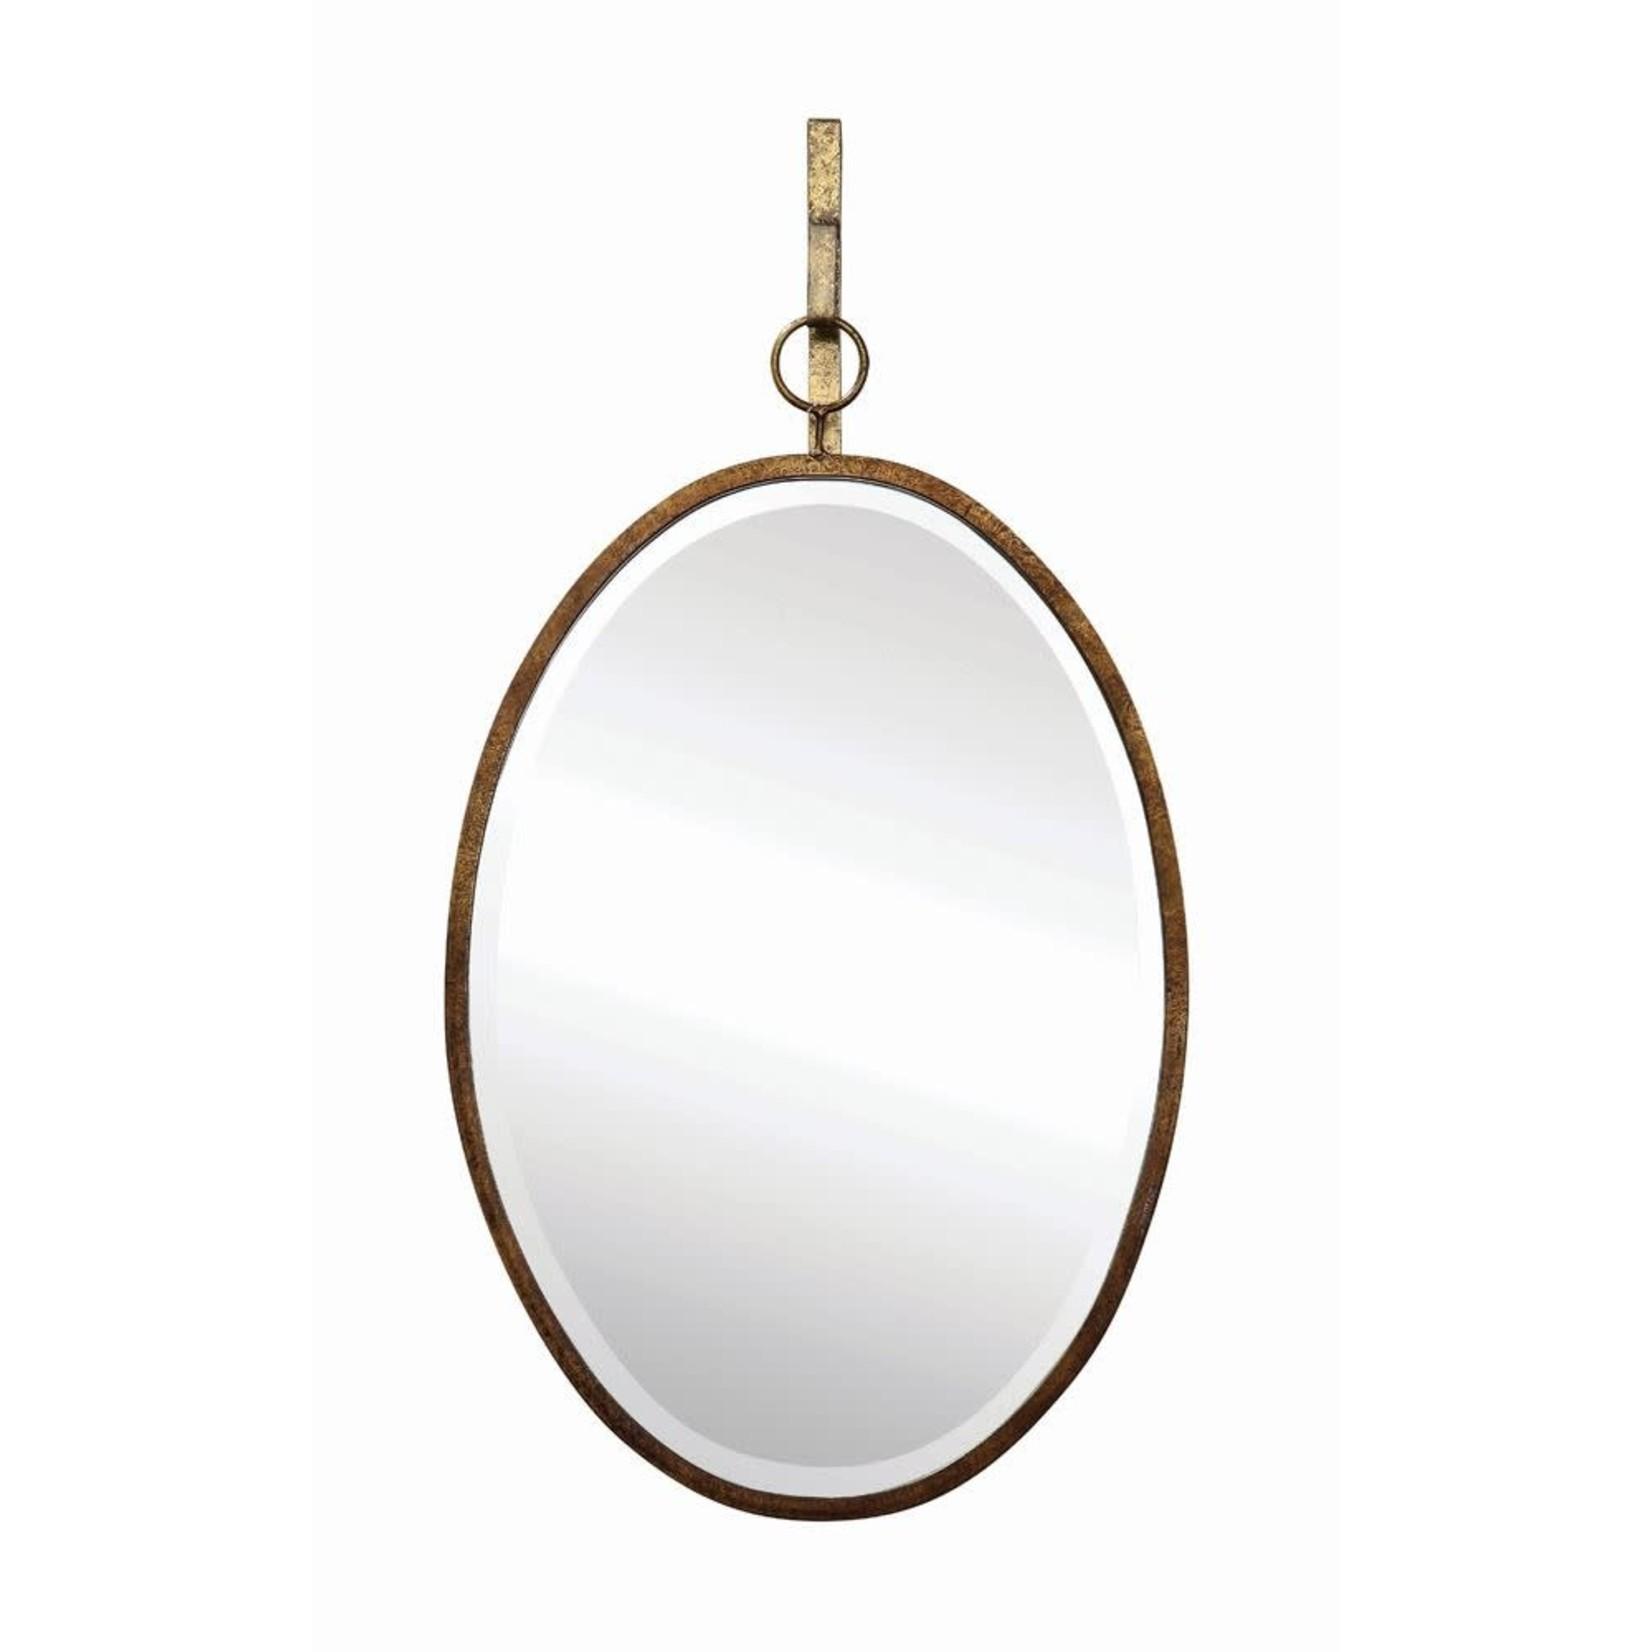 Creative Coop Miroir OVALE